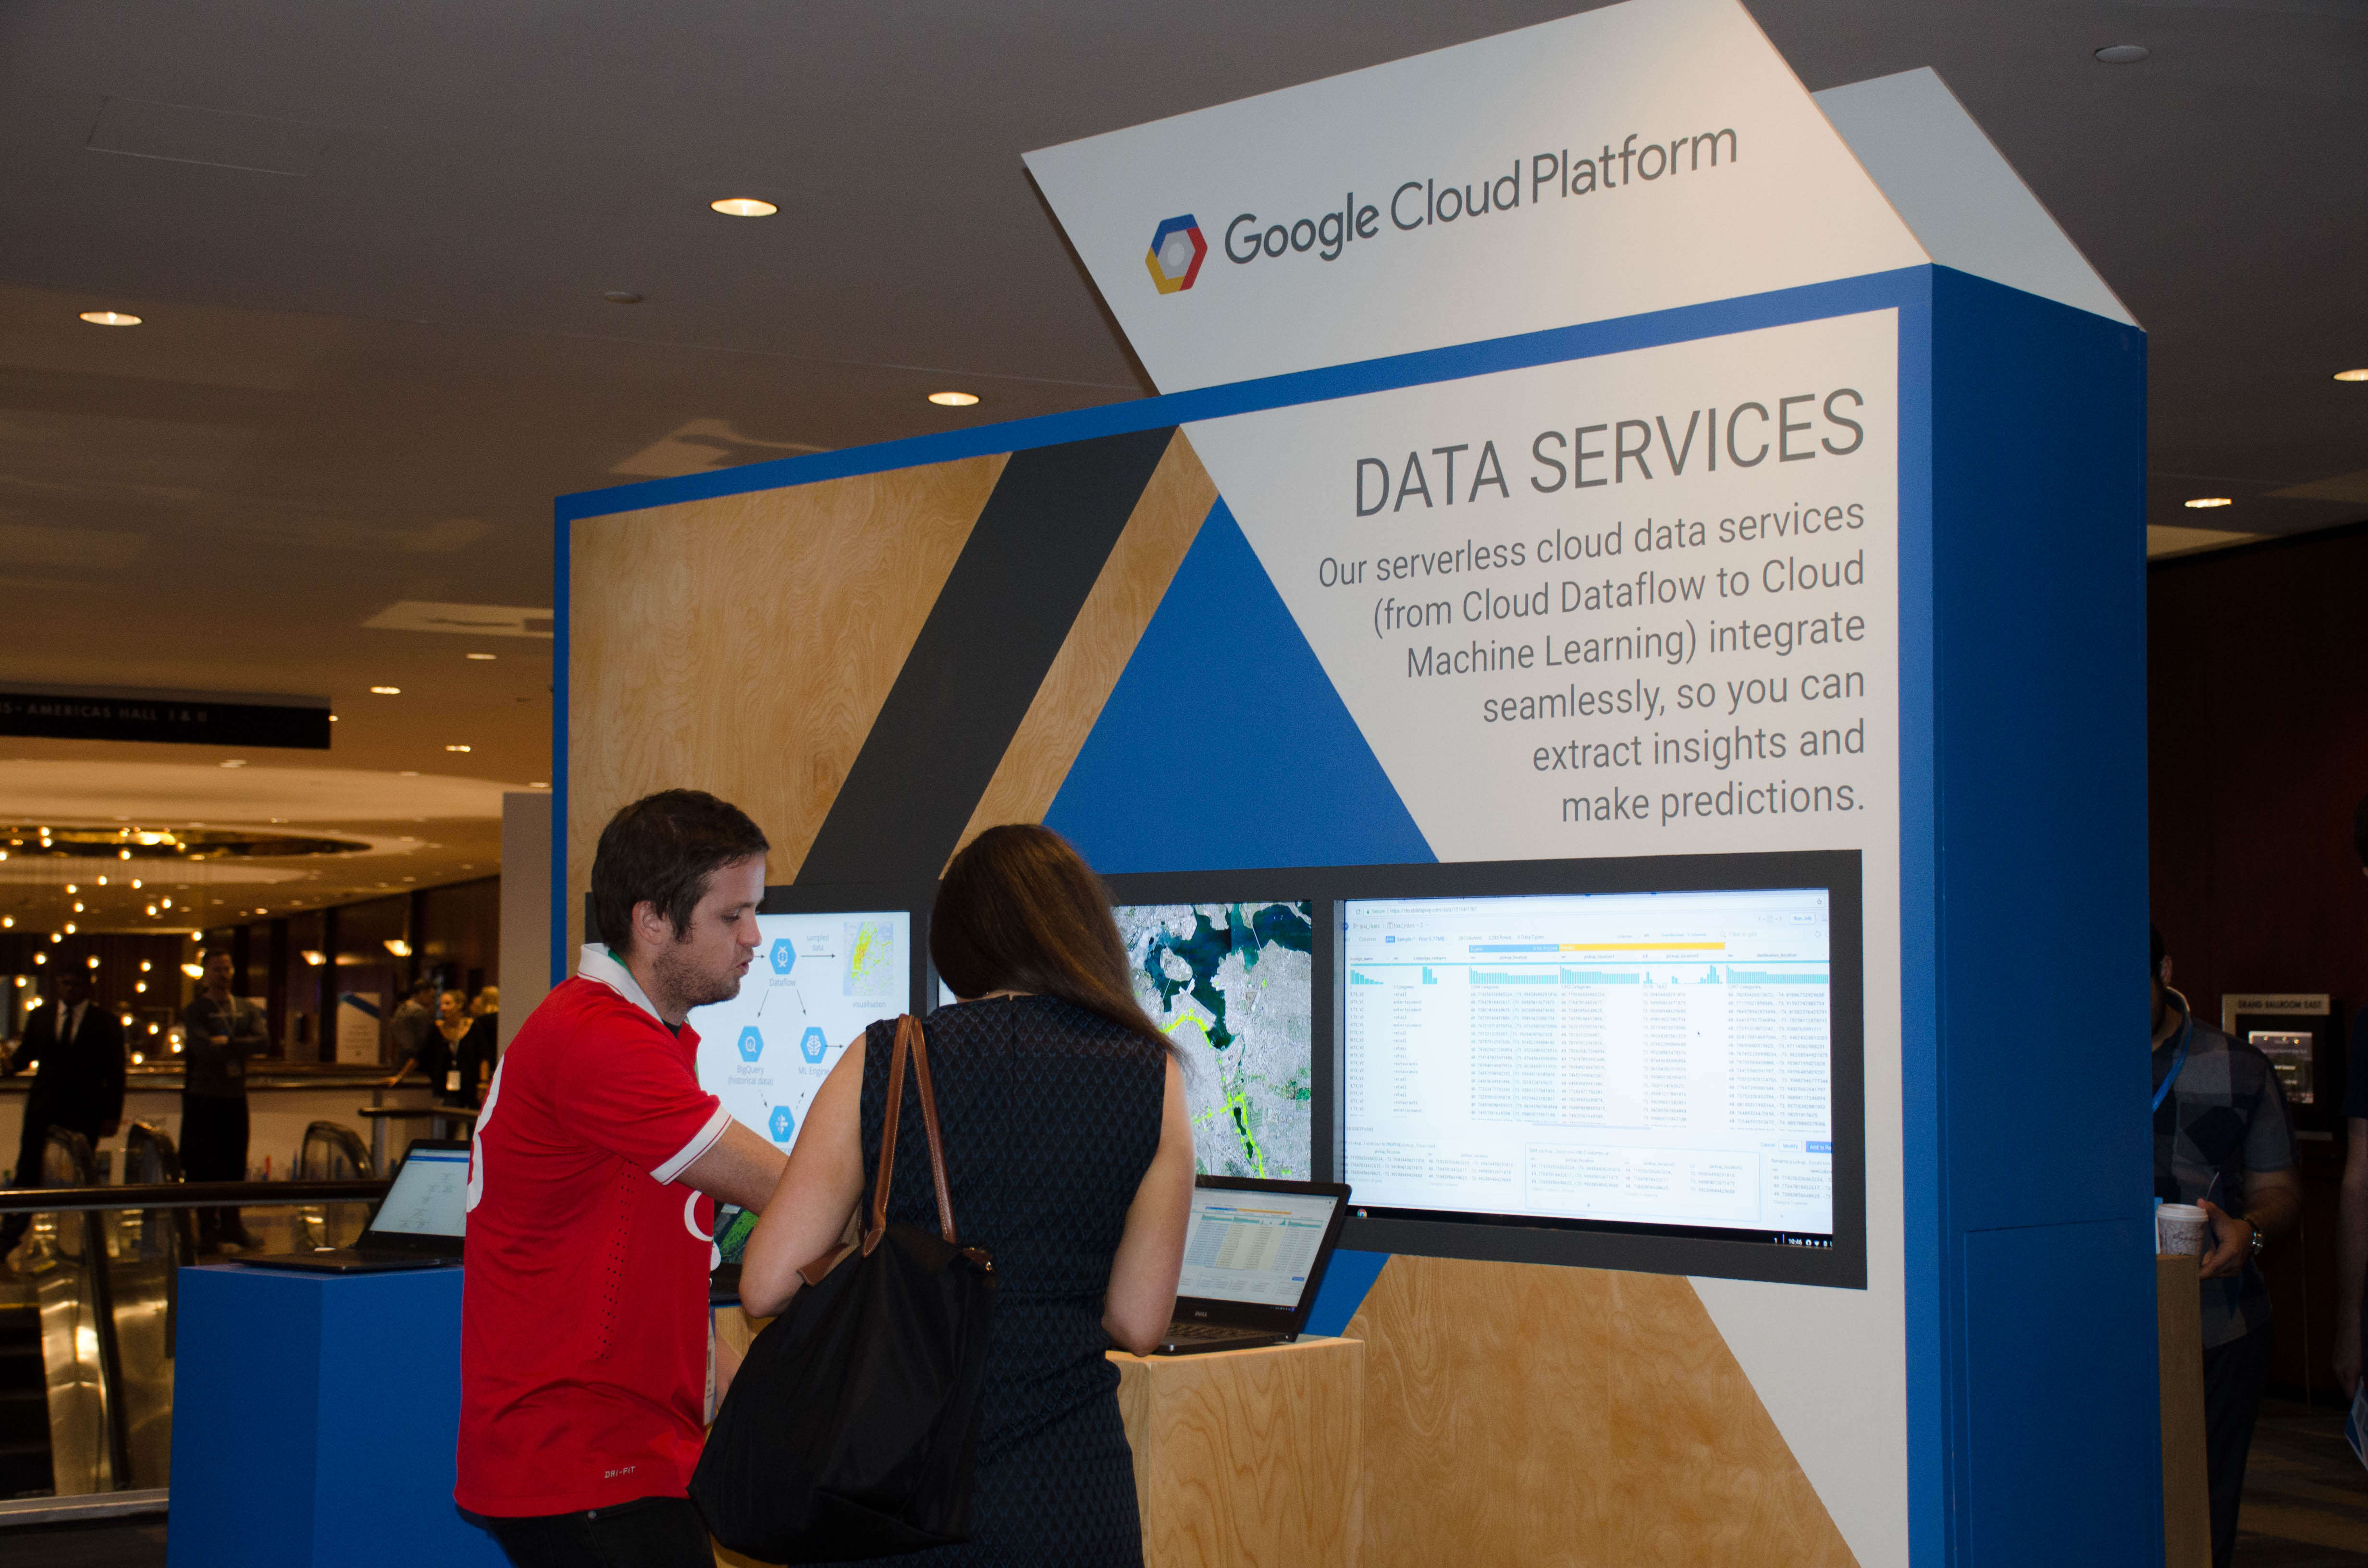 Google Platform Data Services